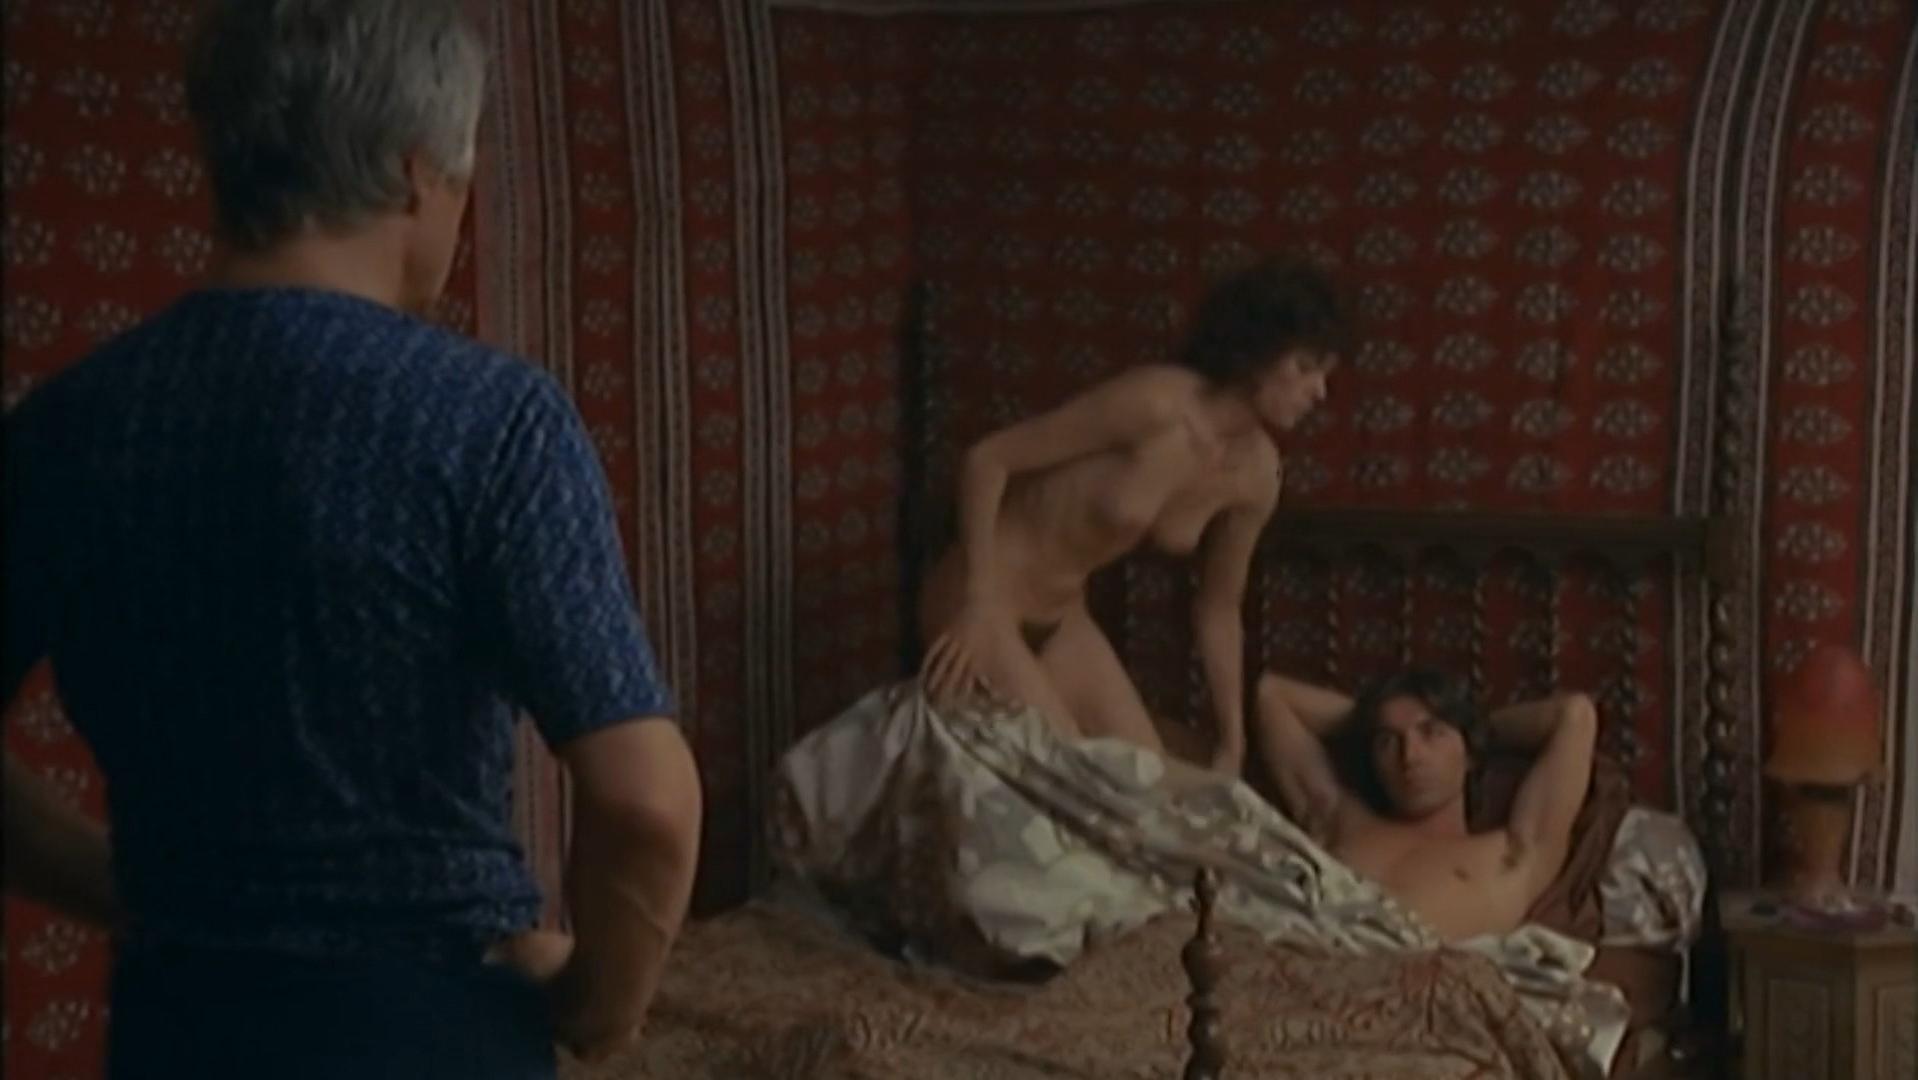 Daniele Gegauff nude - Une Partie de Plaisir (1975)